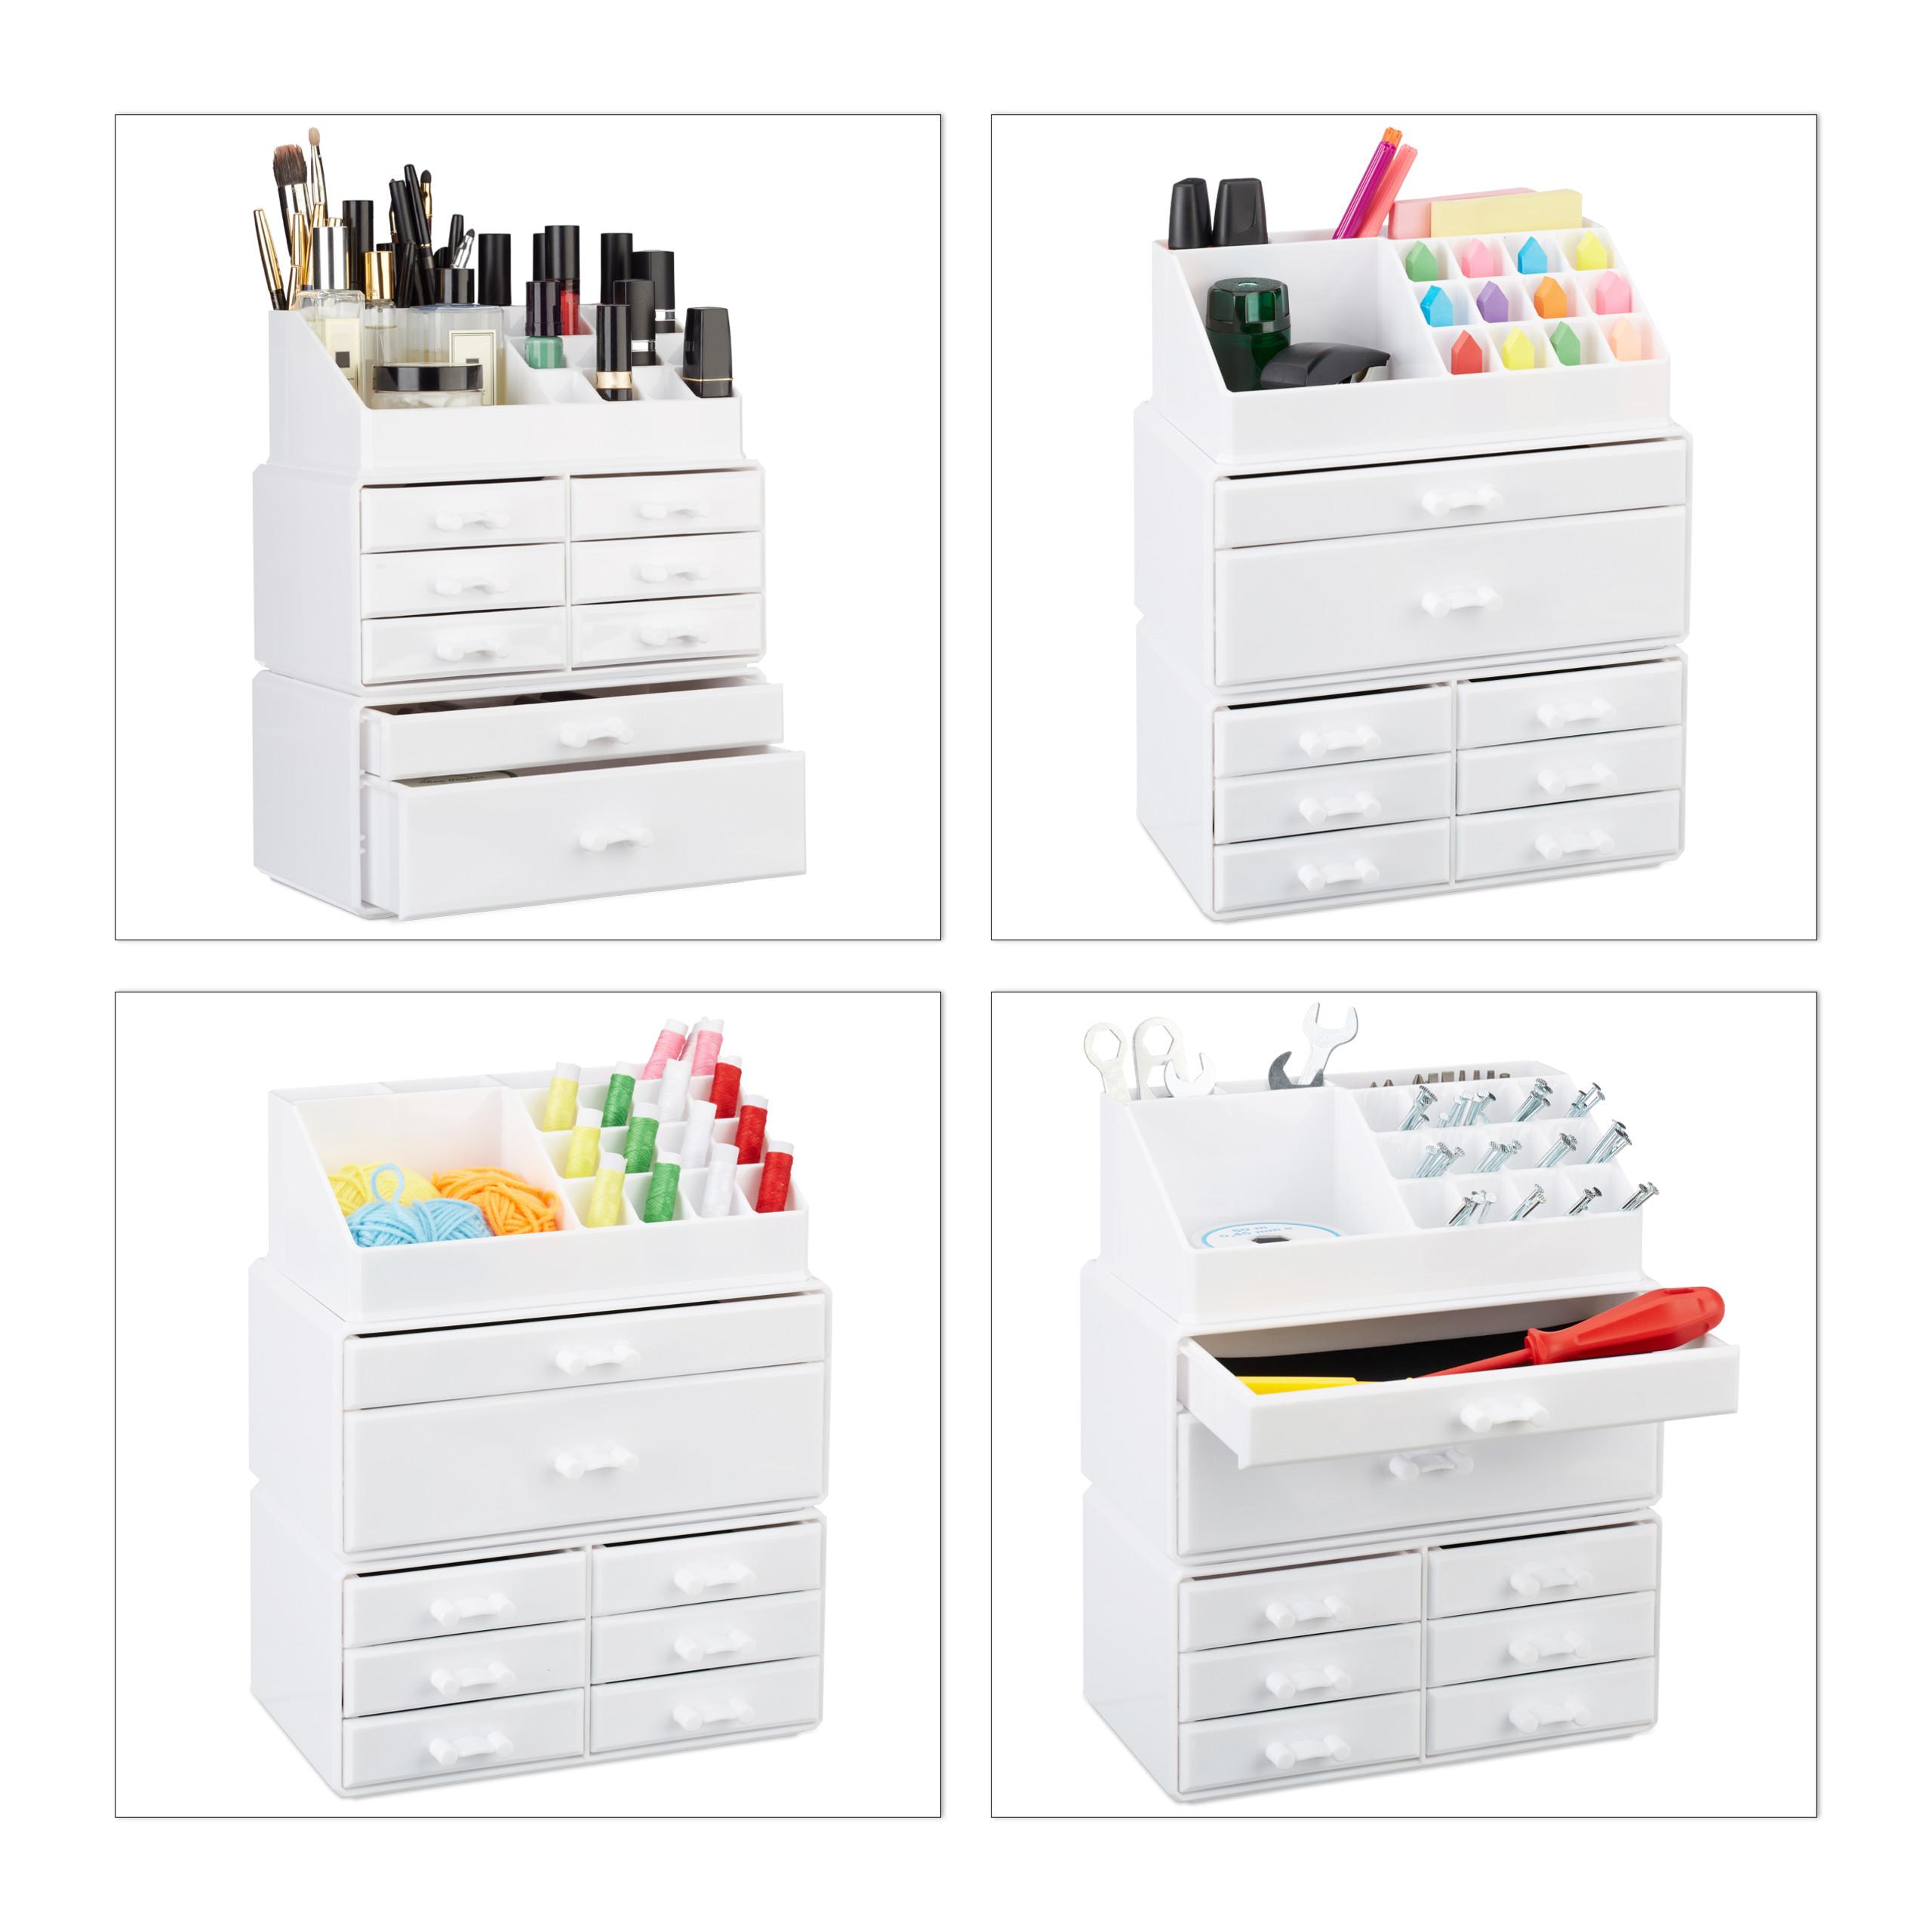 make-up-organizer-opbergen-van-cosmetica-acryl-stapelbaar-met-lades miniatuur 39